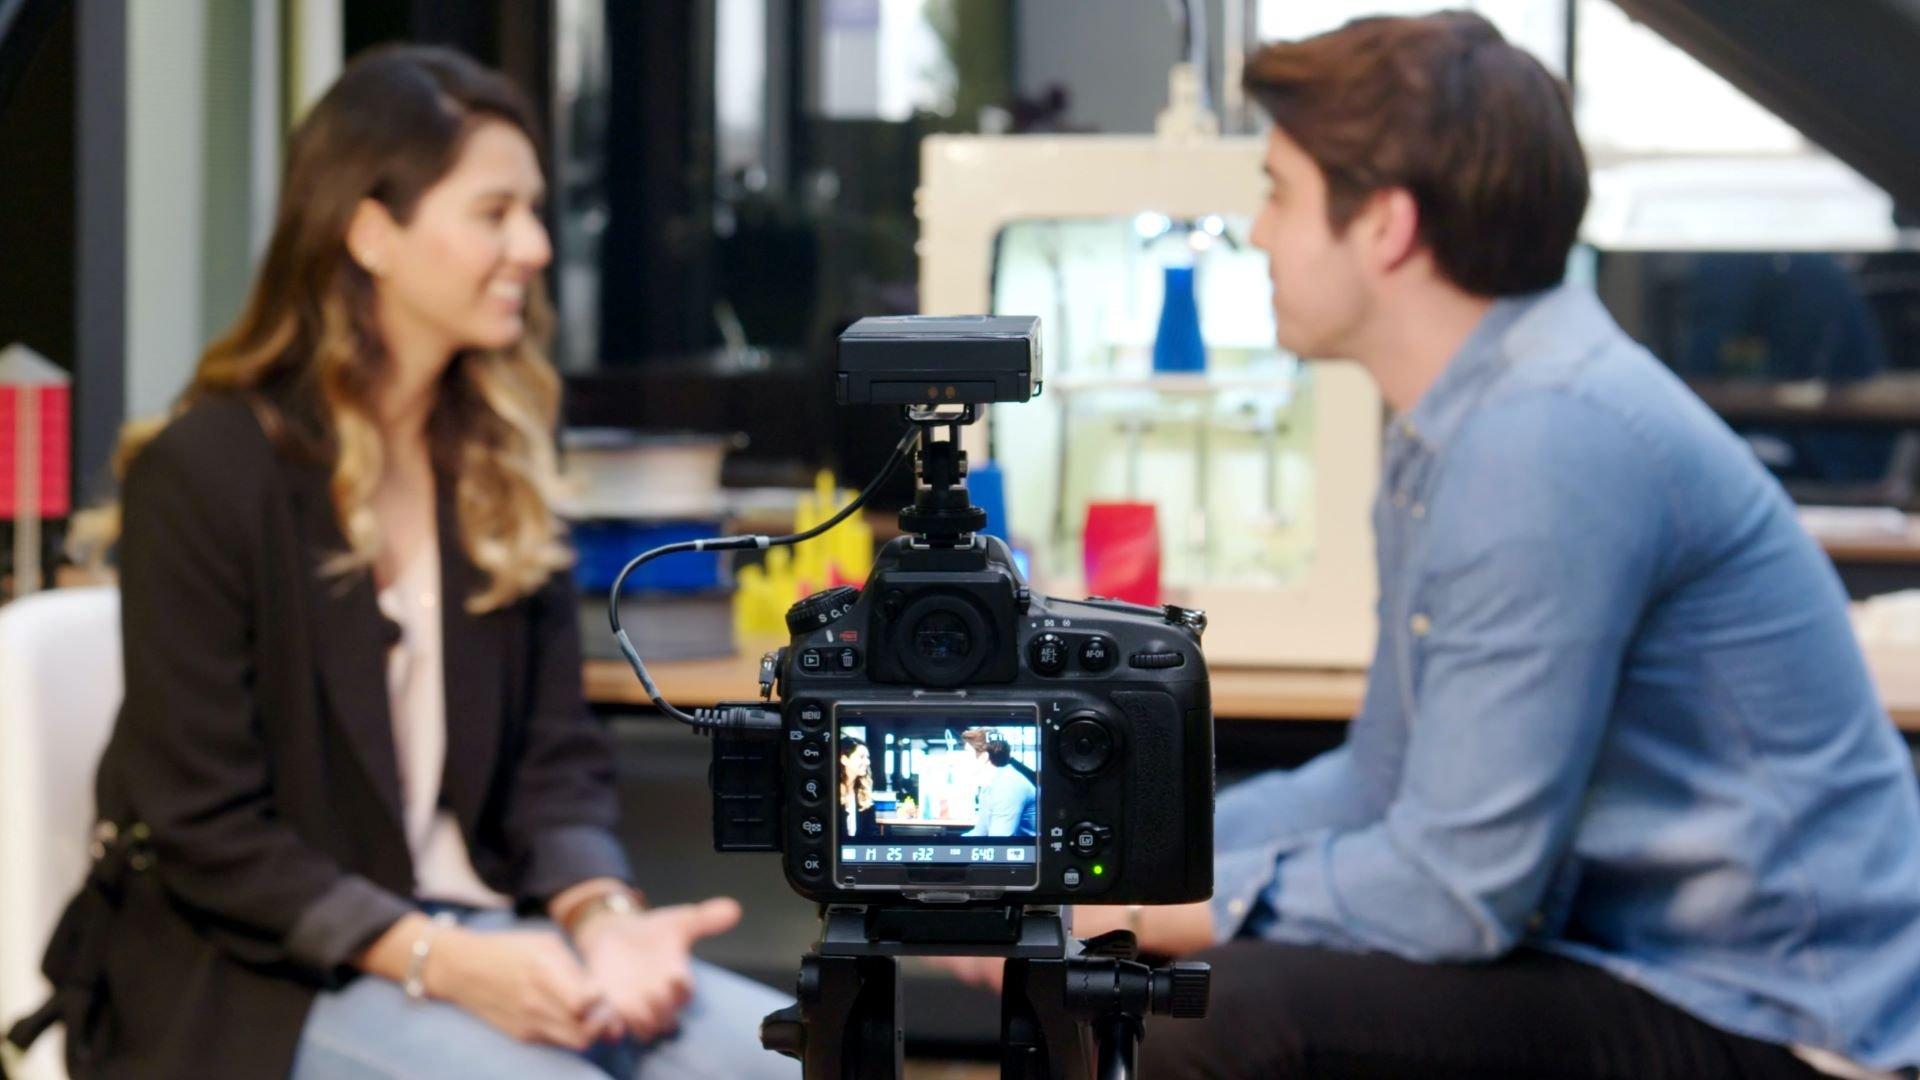 Video director preparing onscreen talent for a shoot behind a camera